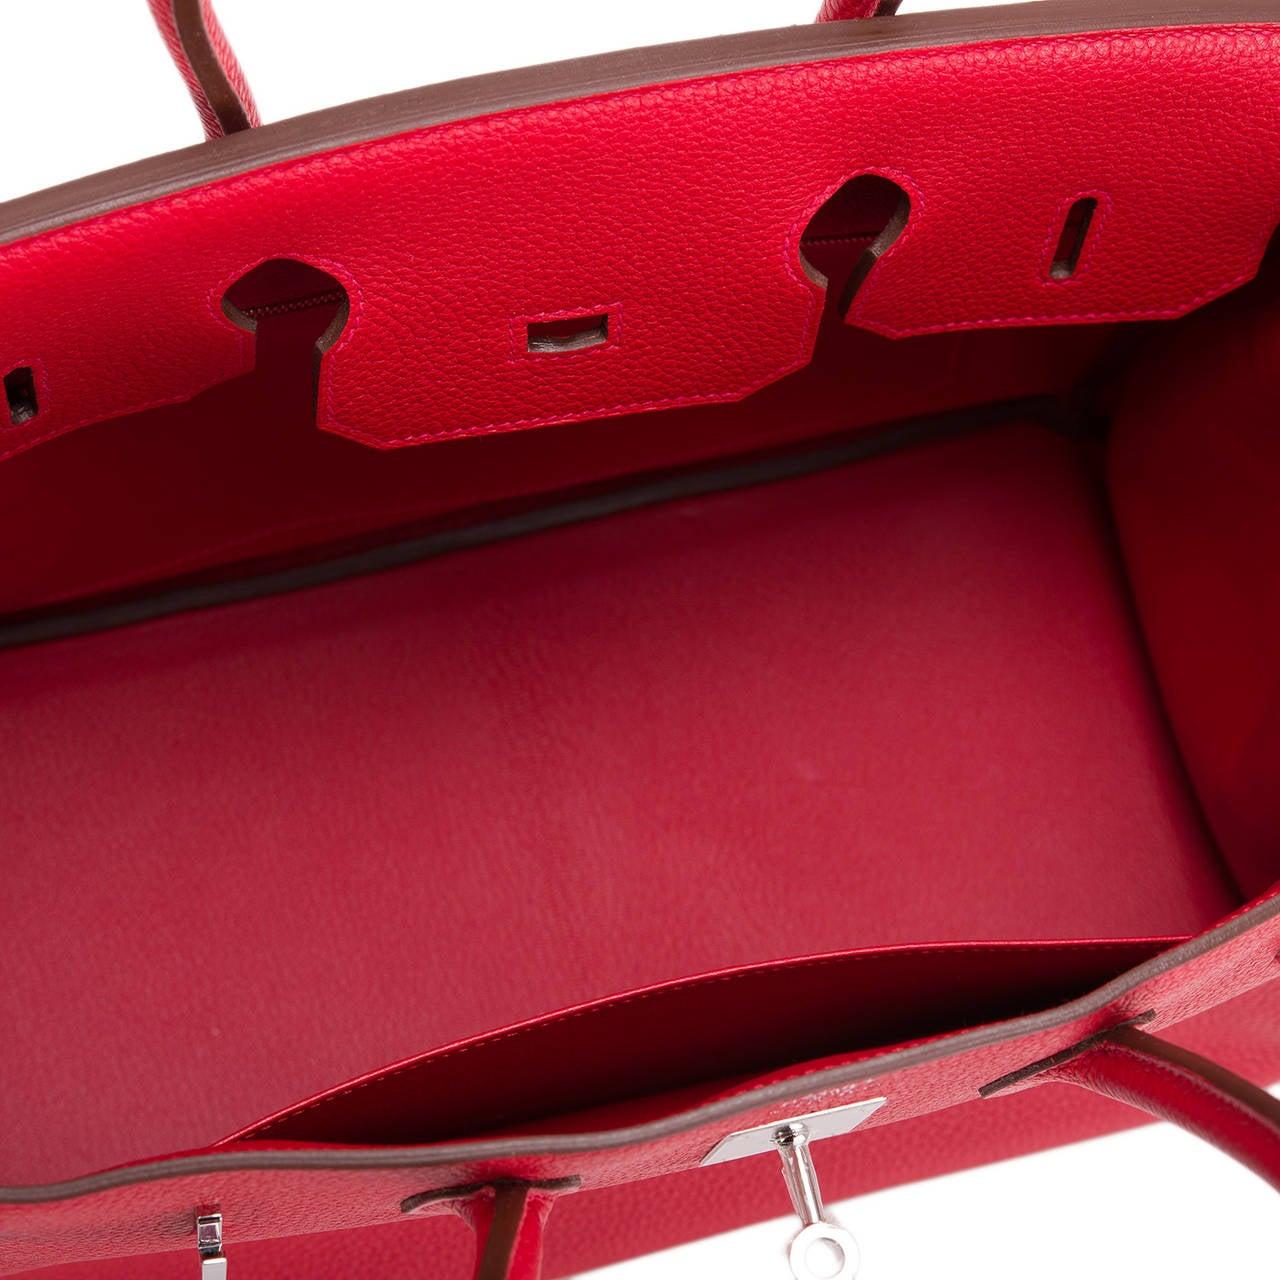 Hermes Rouge Casaque Clemence Birkin 35cm Palladium Hardware For Sale 1